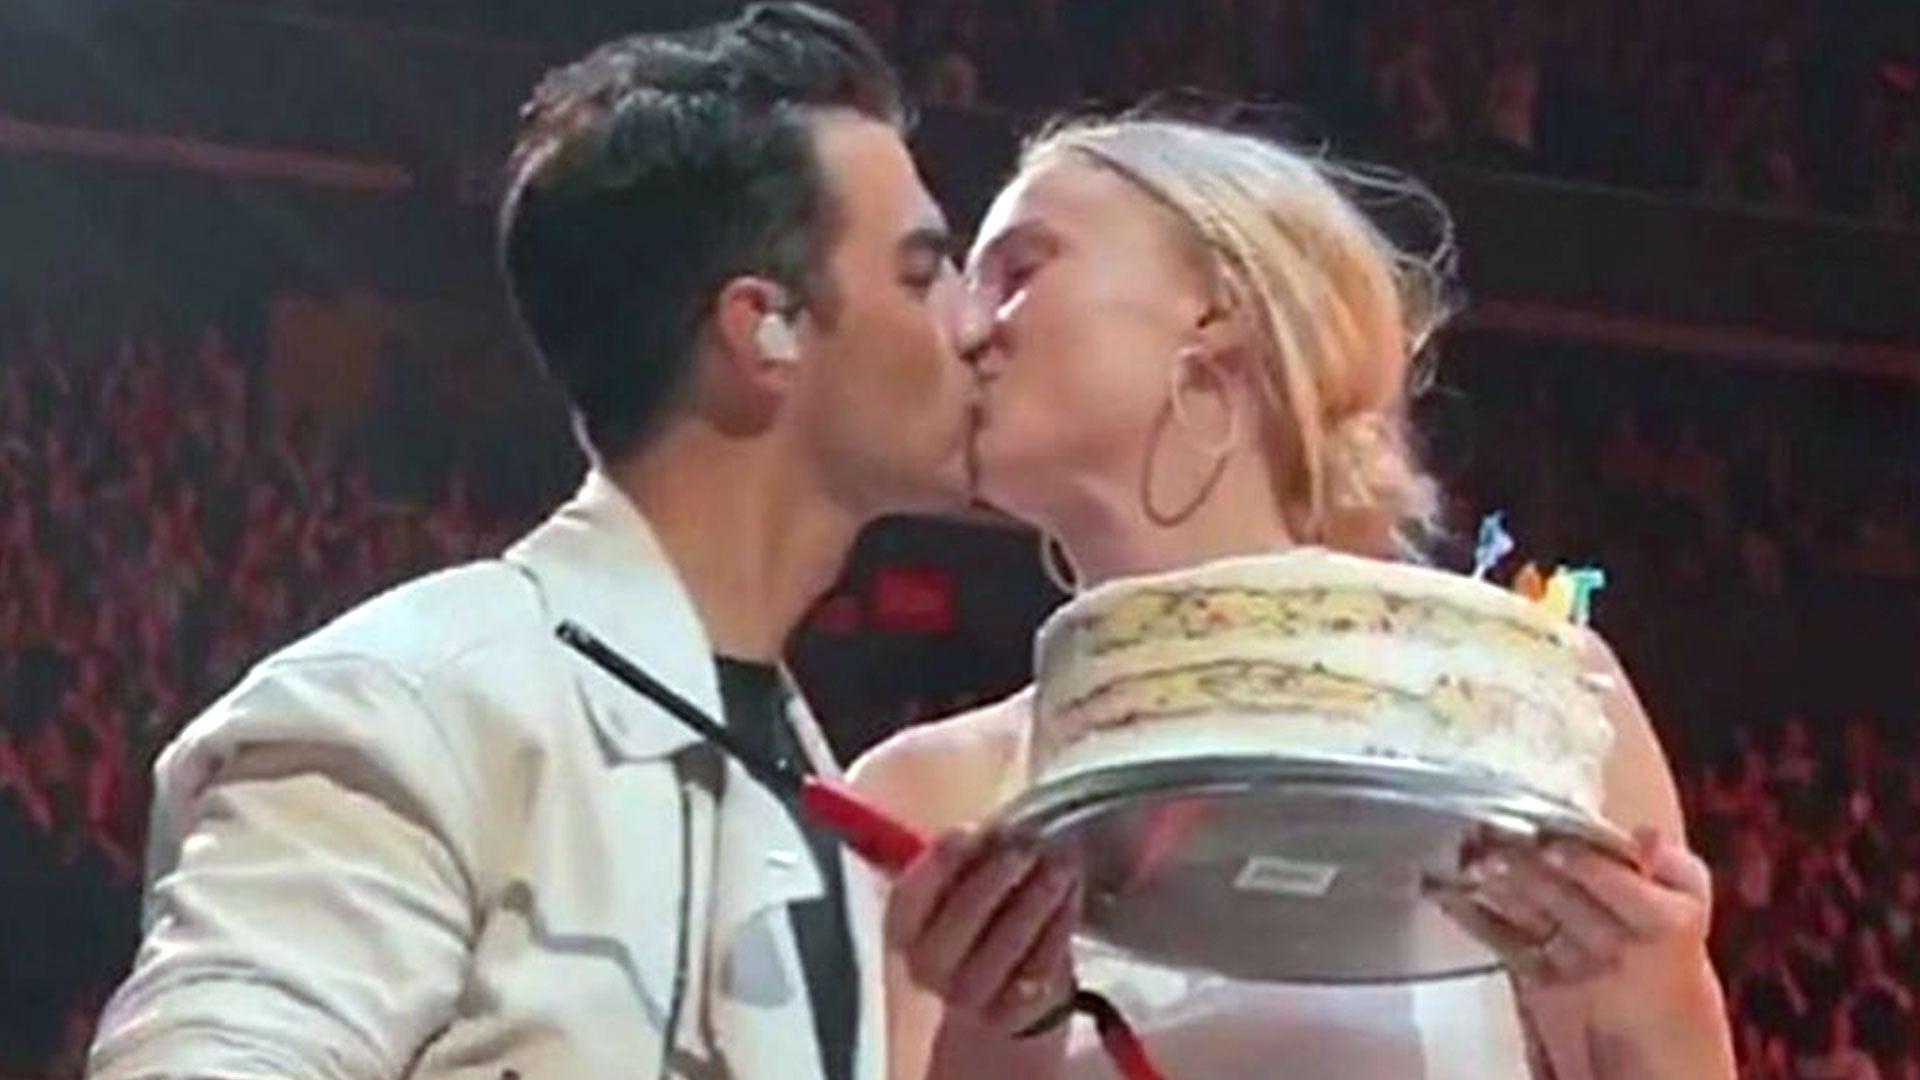 Sophie Turner Joins Jonas Brothers Onstage to Celebrate Joe's 30th Birthday: Watch